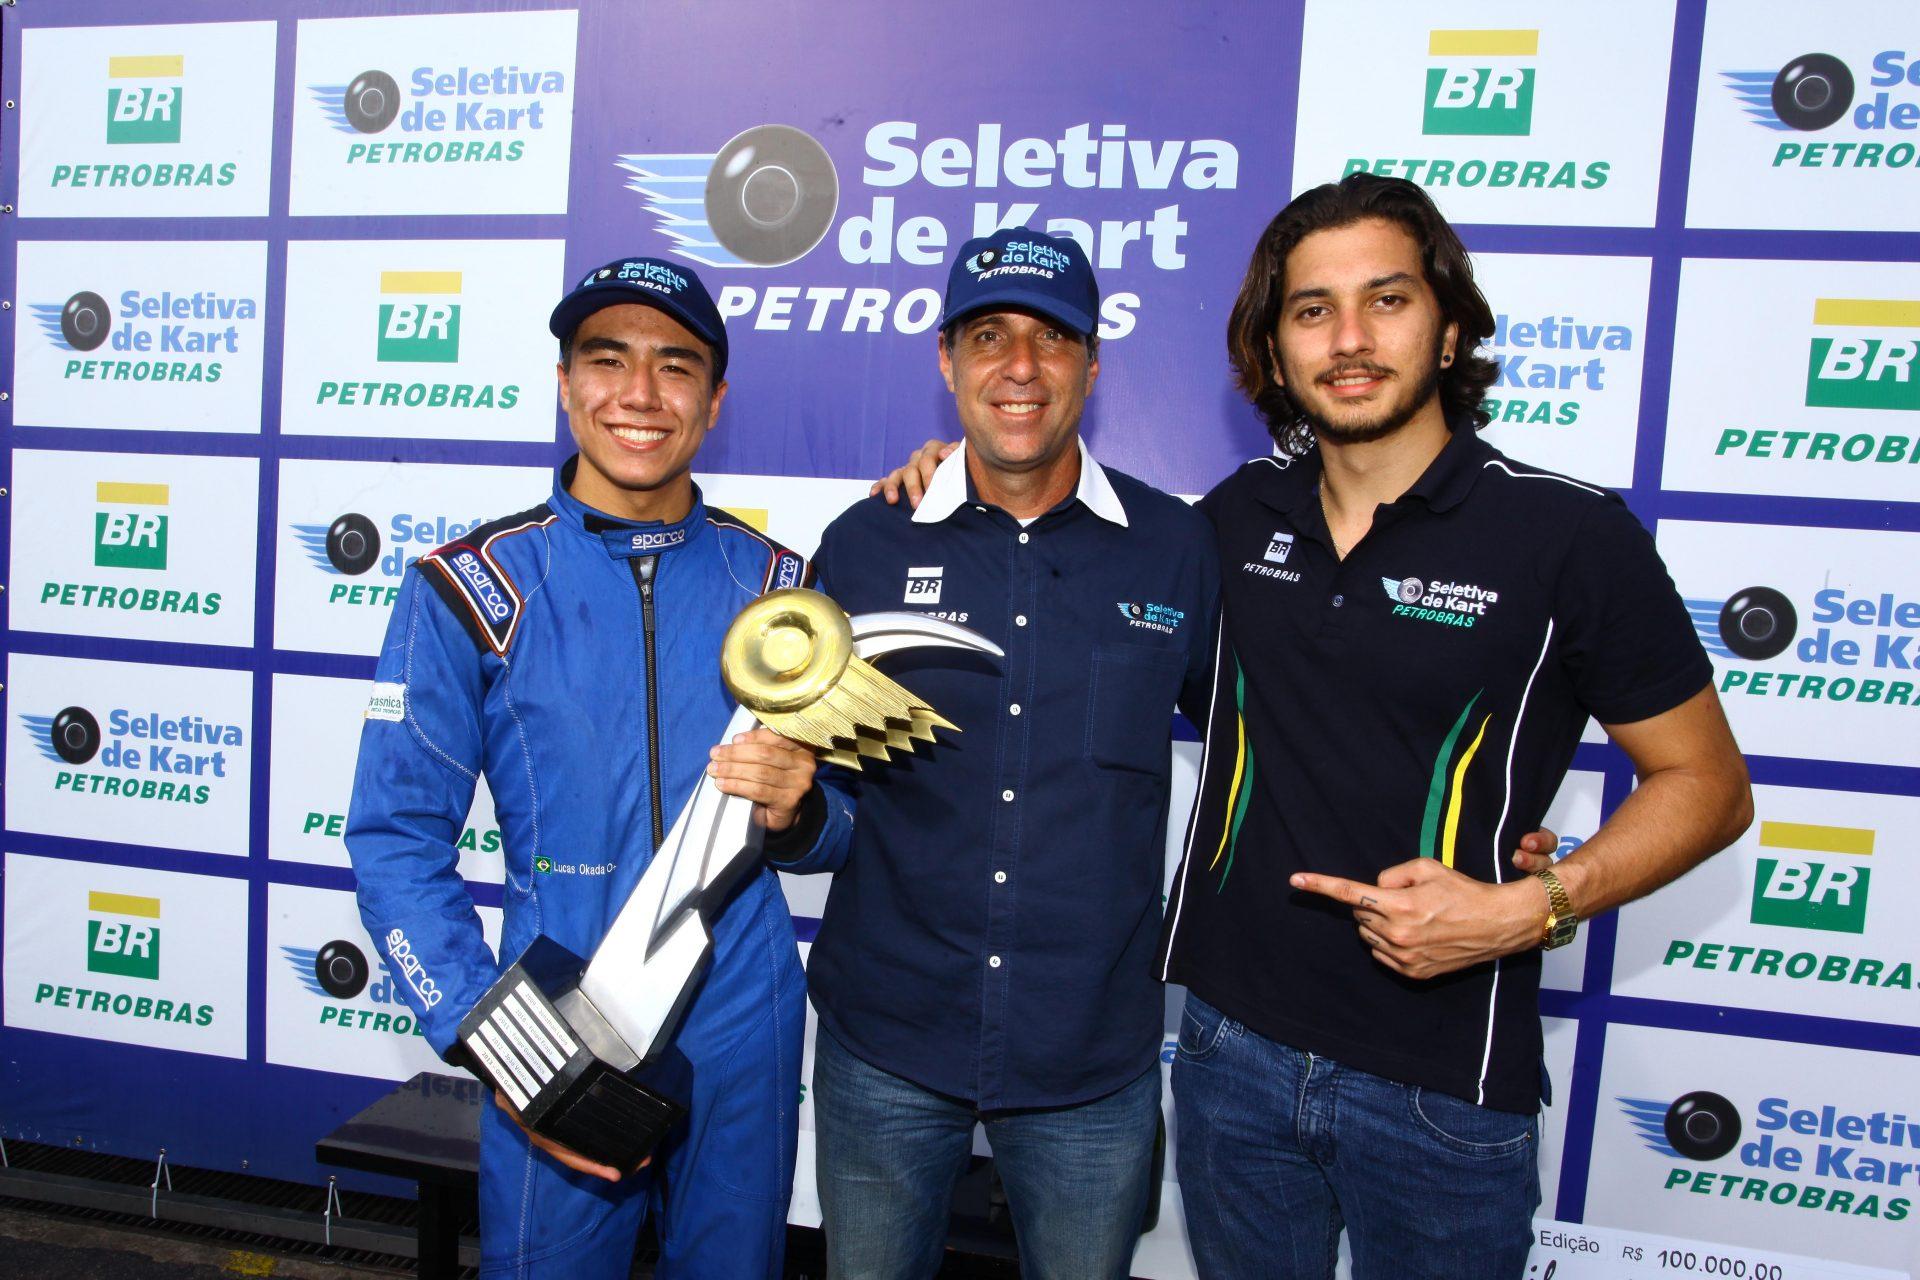 Photo of Kart – Após 20 edições, Seletiva não terá patrocínio da Petrobras